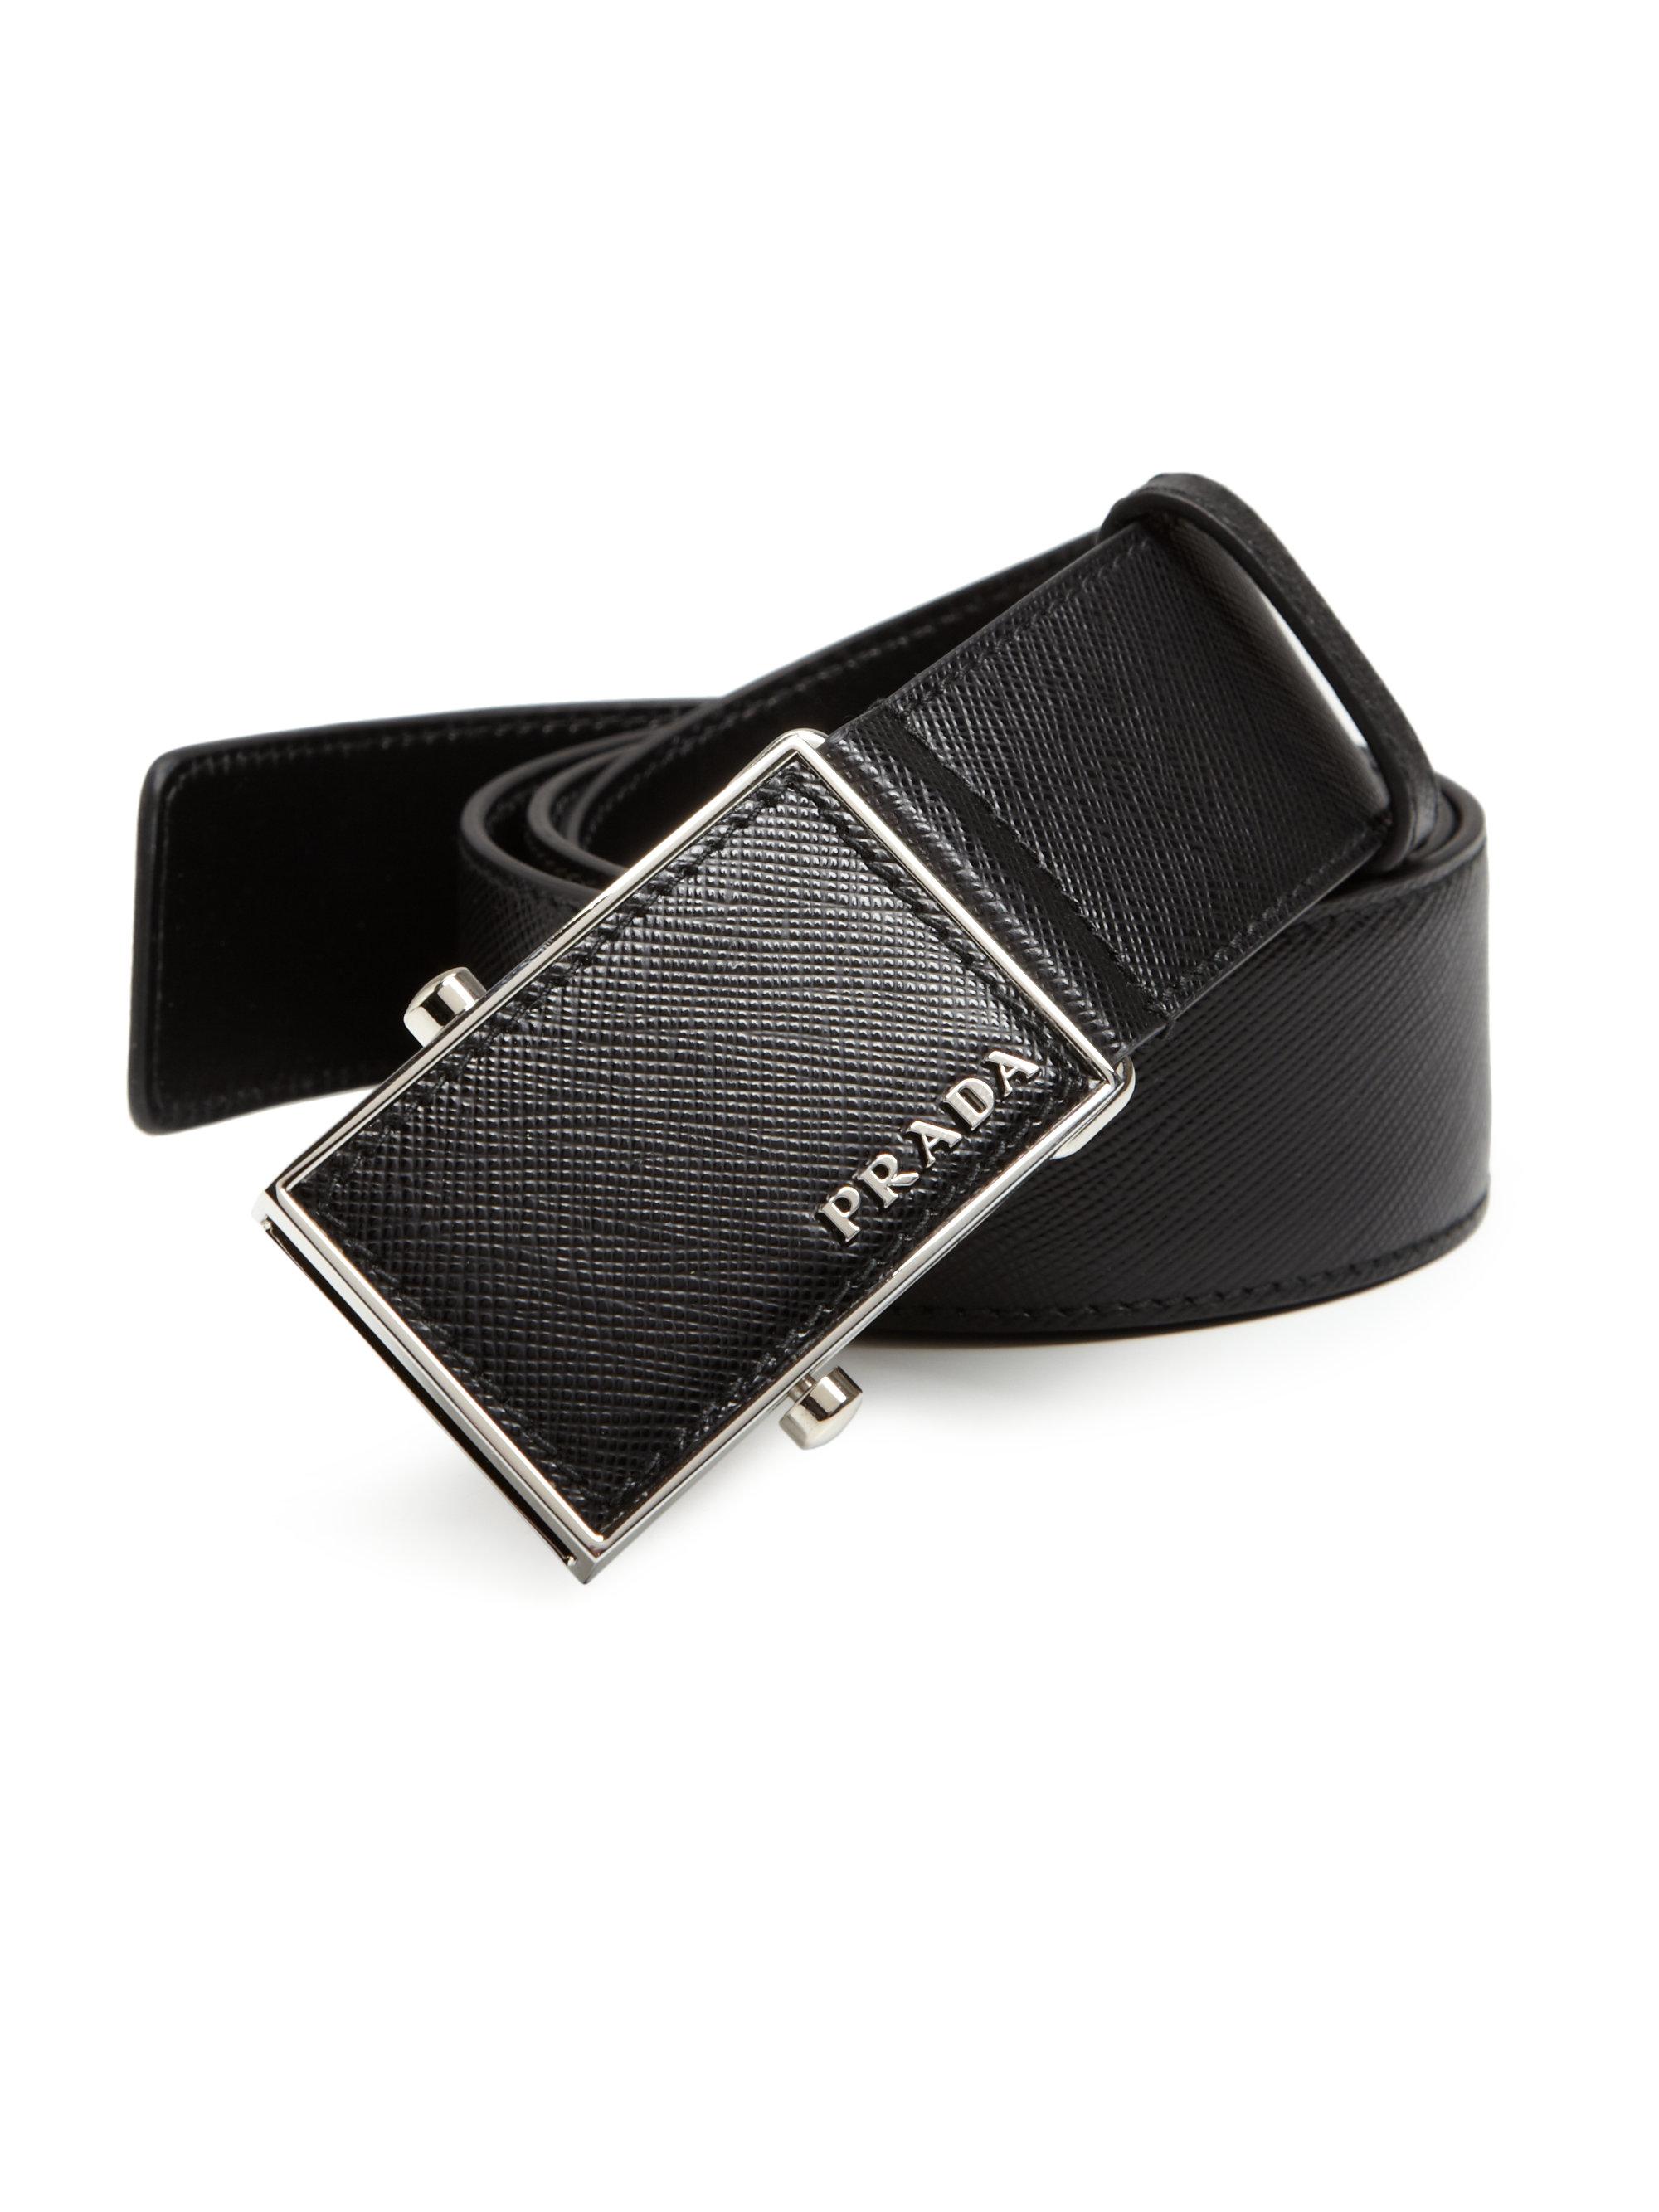 55c3a20f6e489 ... reduced lyst prada saffiano leather plaque belt in black for men 827c6  019ef coupon for prada saffiano reversible ...